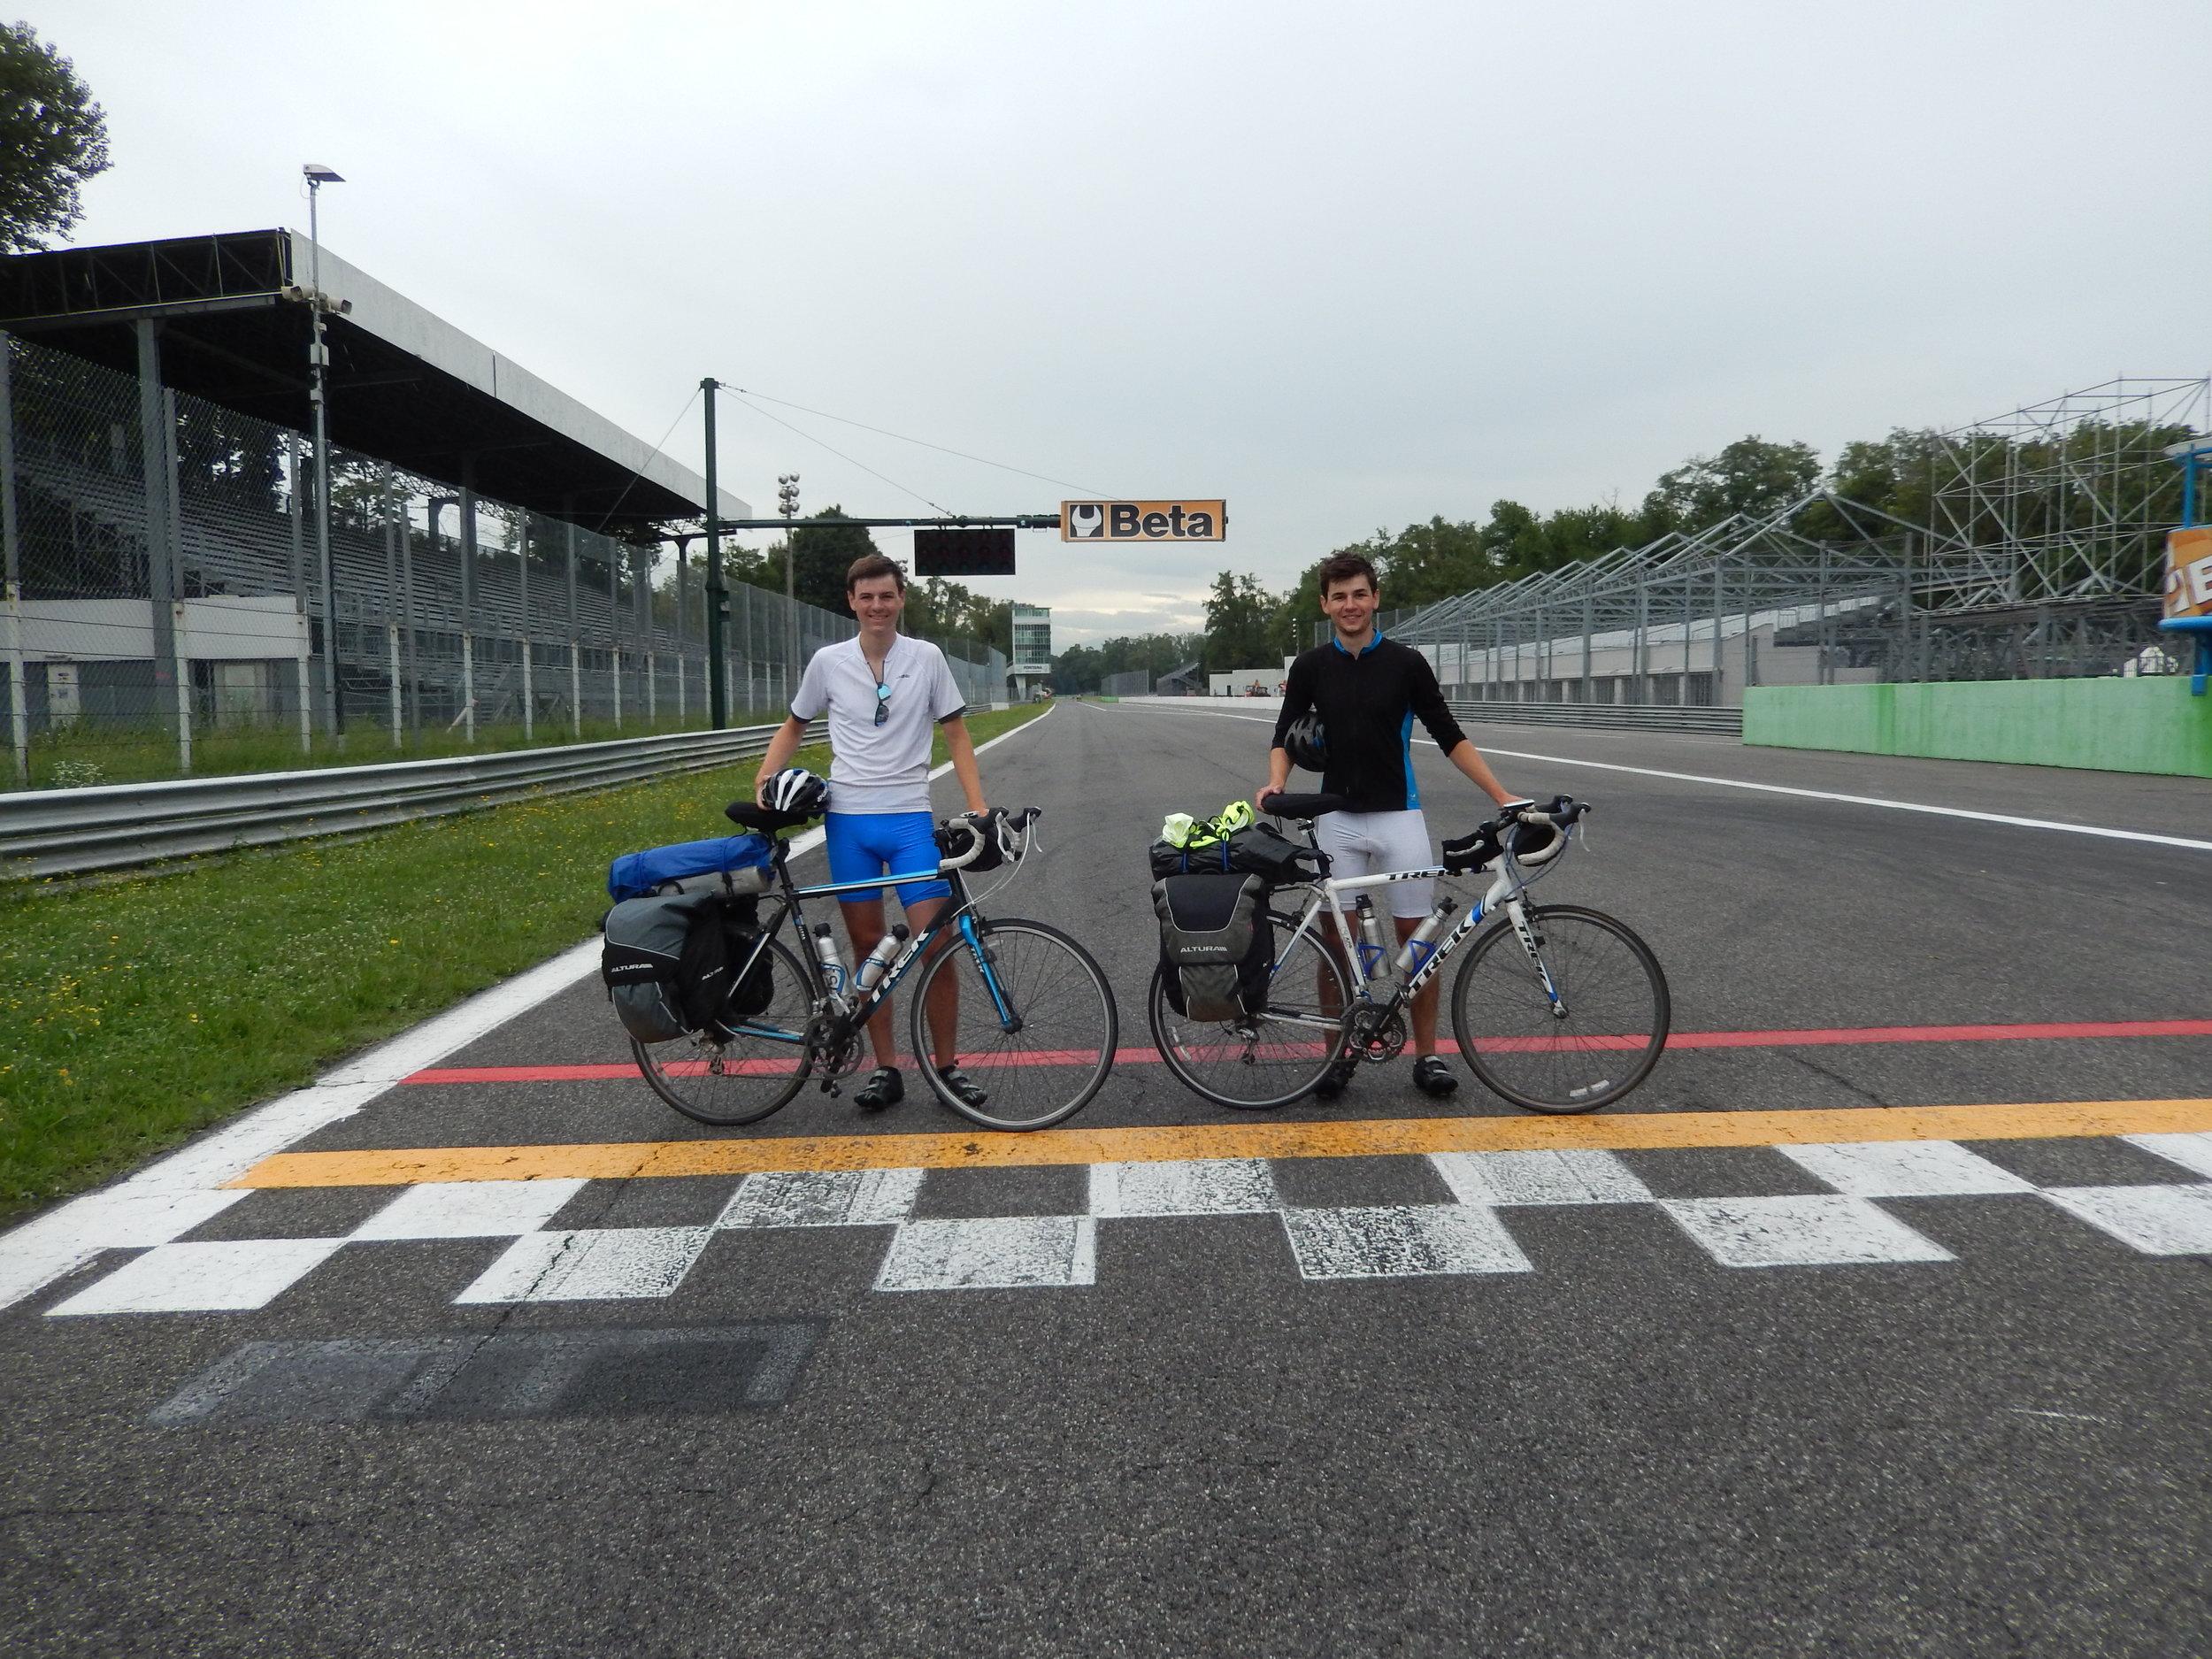 2 excited Formula 1 fans! - Autodromo Nazionale Monza, Italy